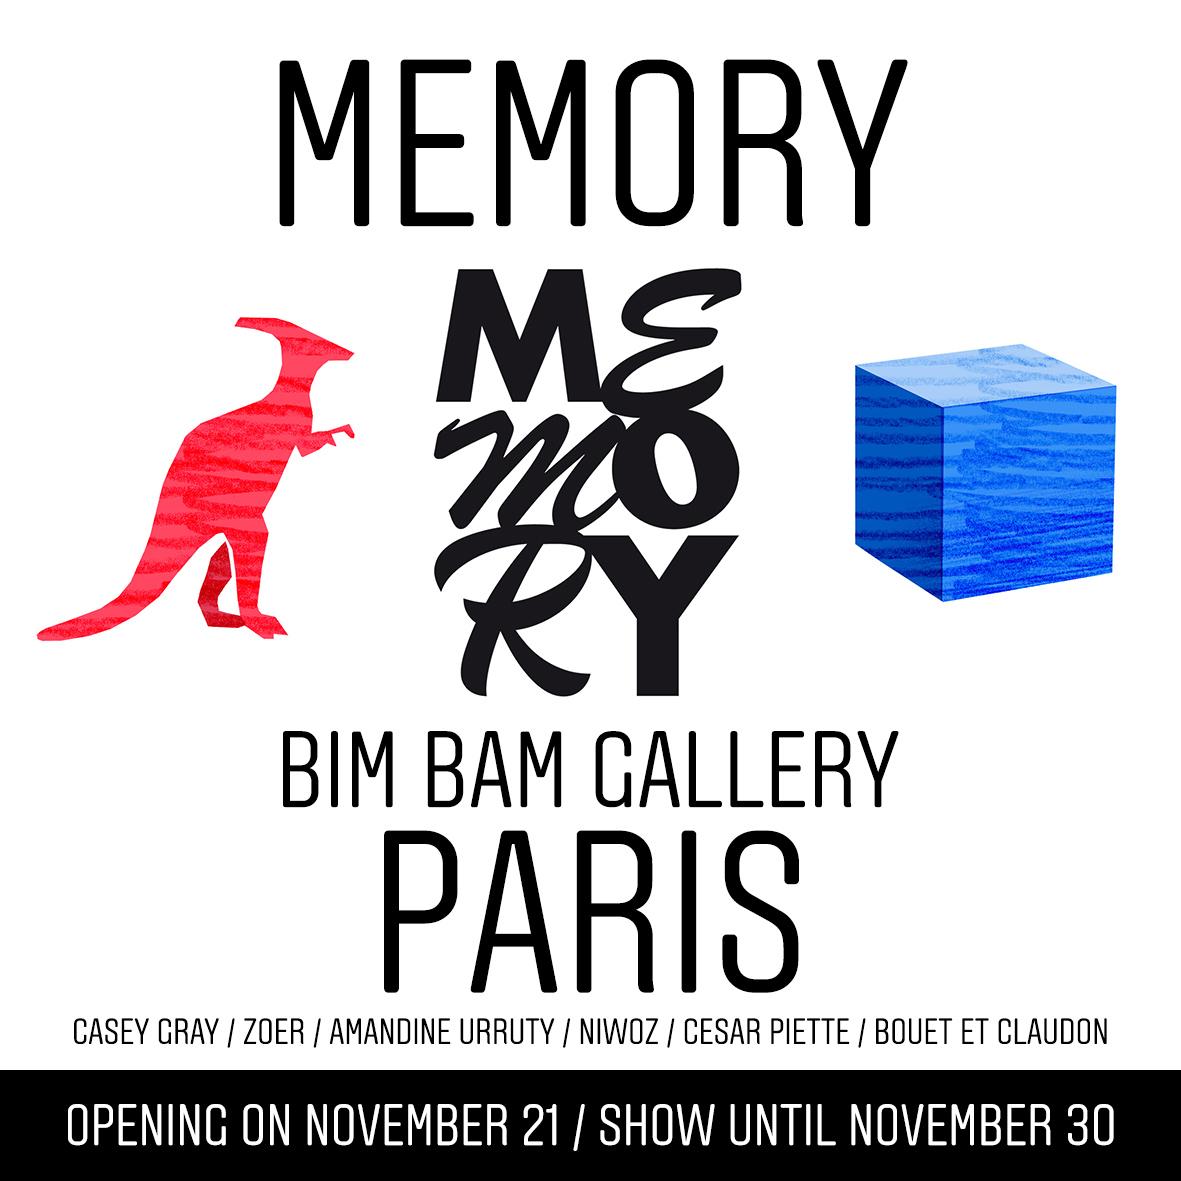 Amandine Urruty - Memory - Bim Bam Gallery